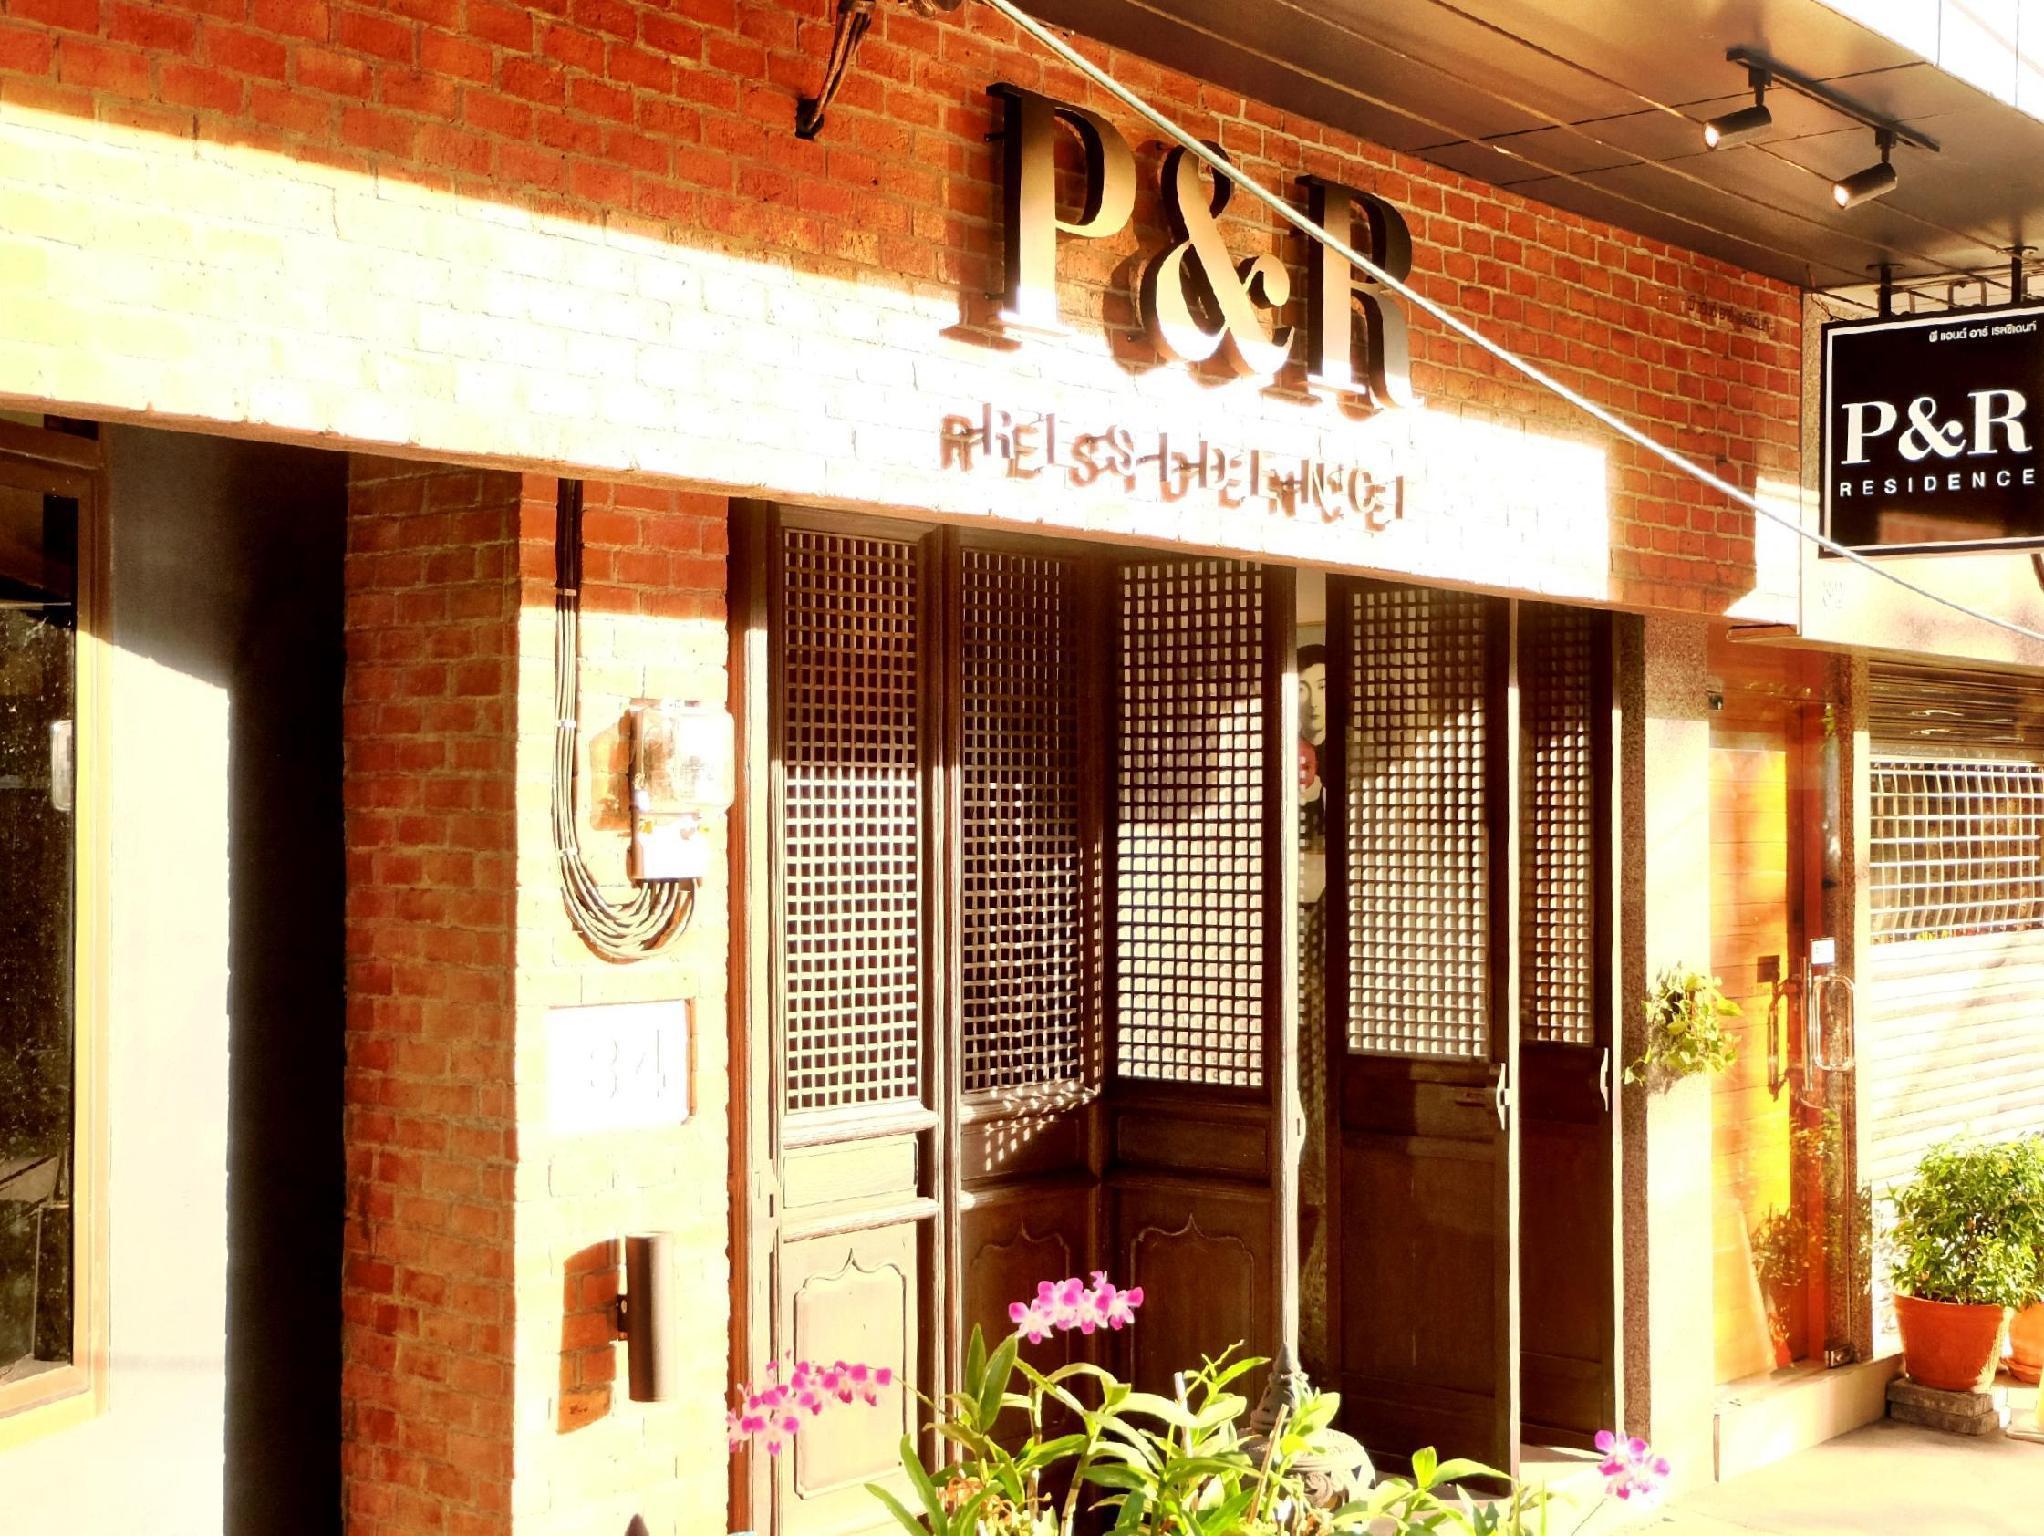 P & R Residence Hotel พี แอนด์ อาร์ เรสซิเดนซ์